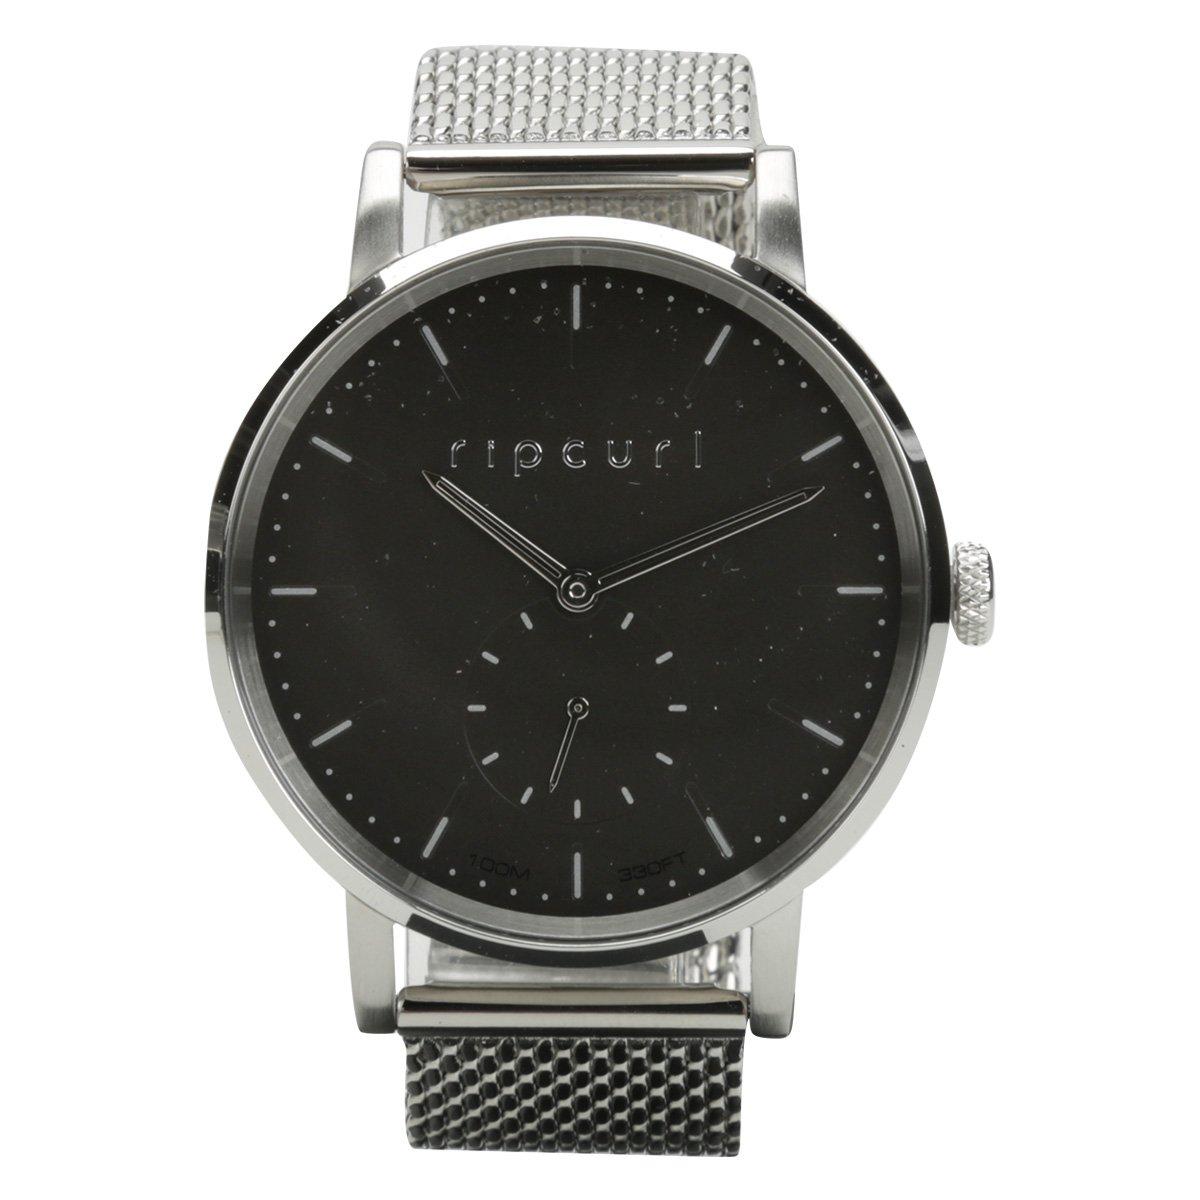 75fa3a020a2 Relógio Rip Curl Circa SSS - Compre Agora